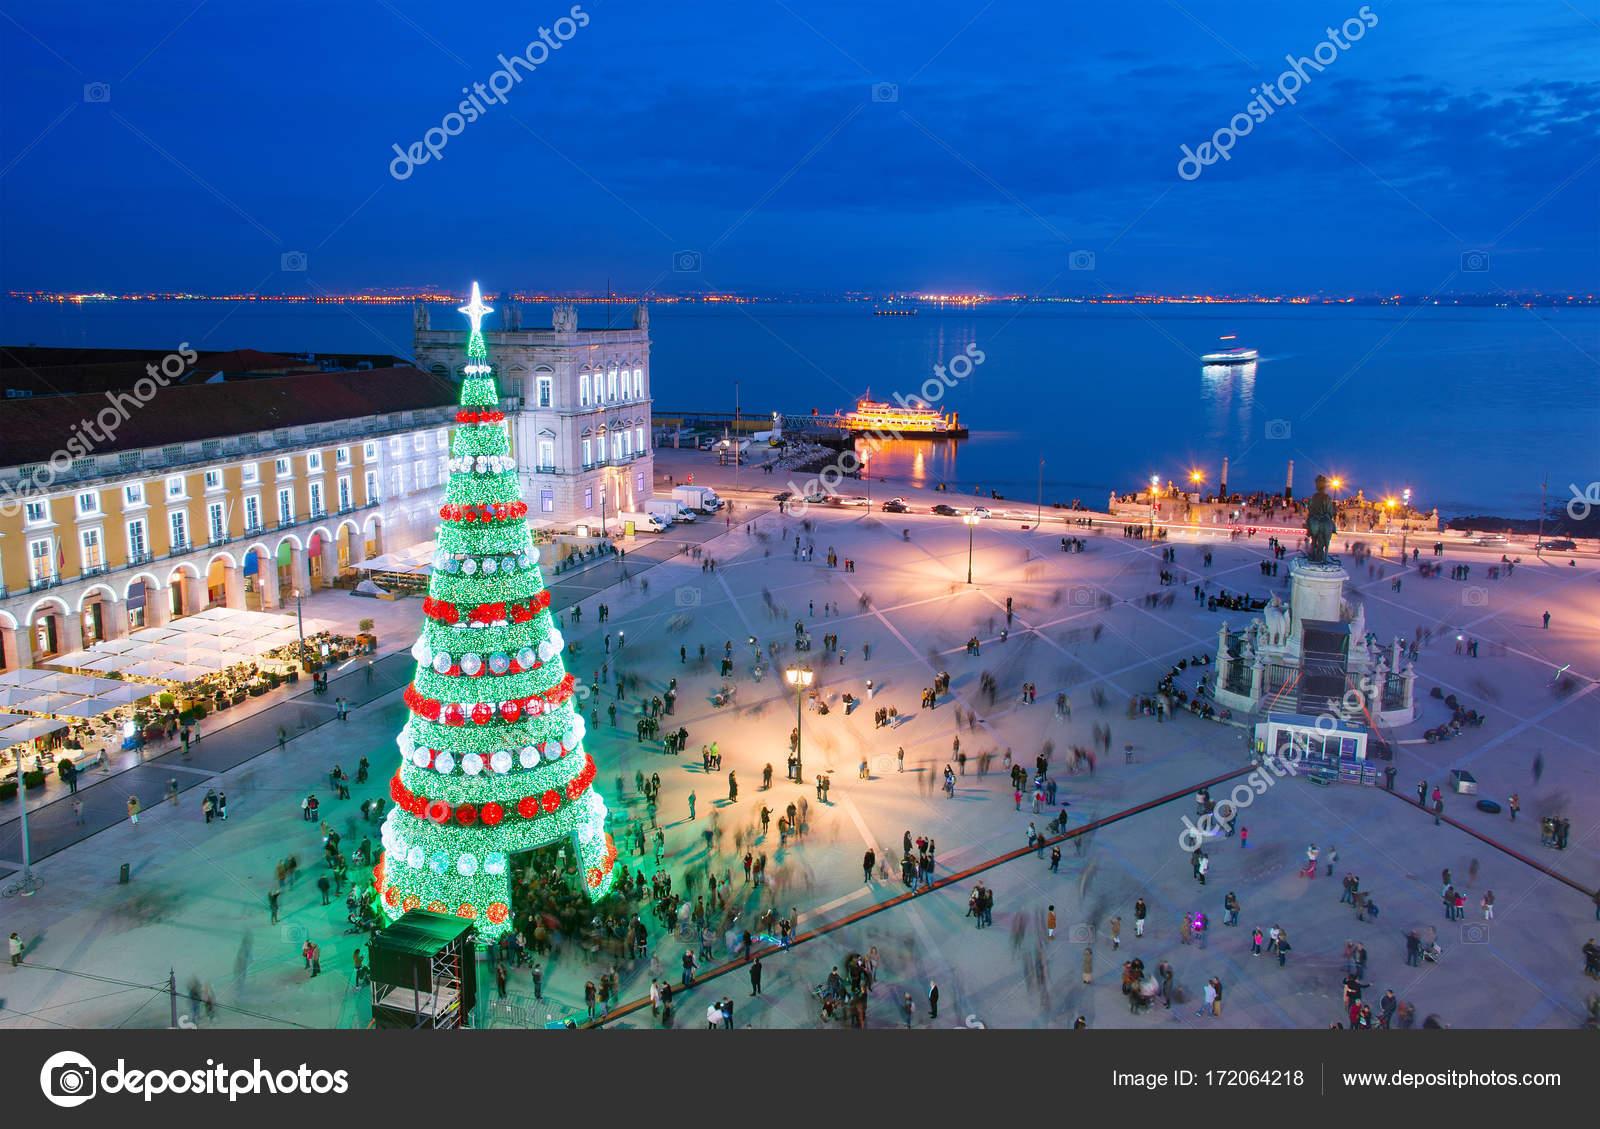 Christmas In Portugal.Lisbon Christmas Celebration Portugal Stock Photo